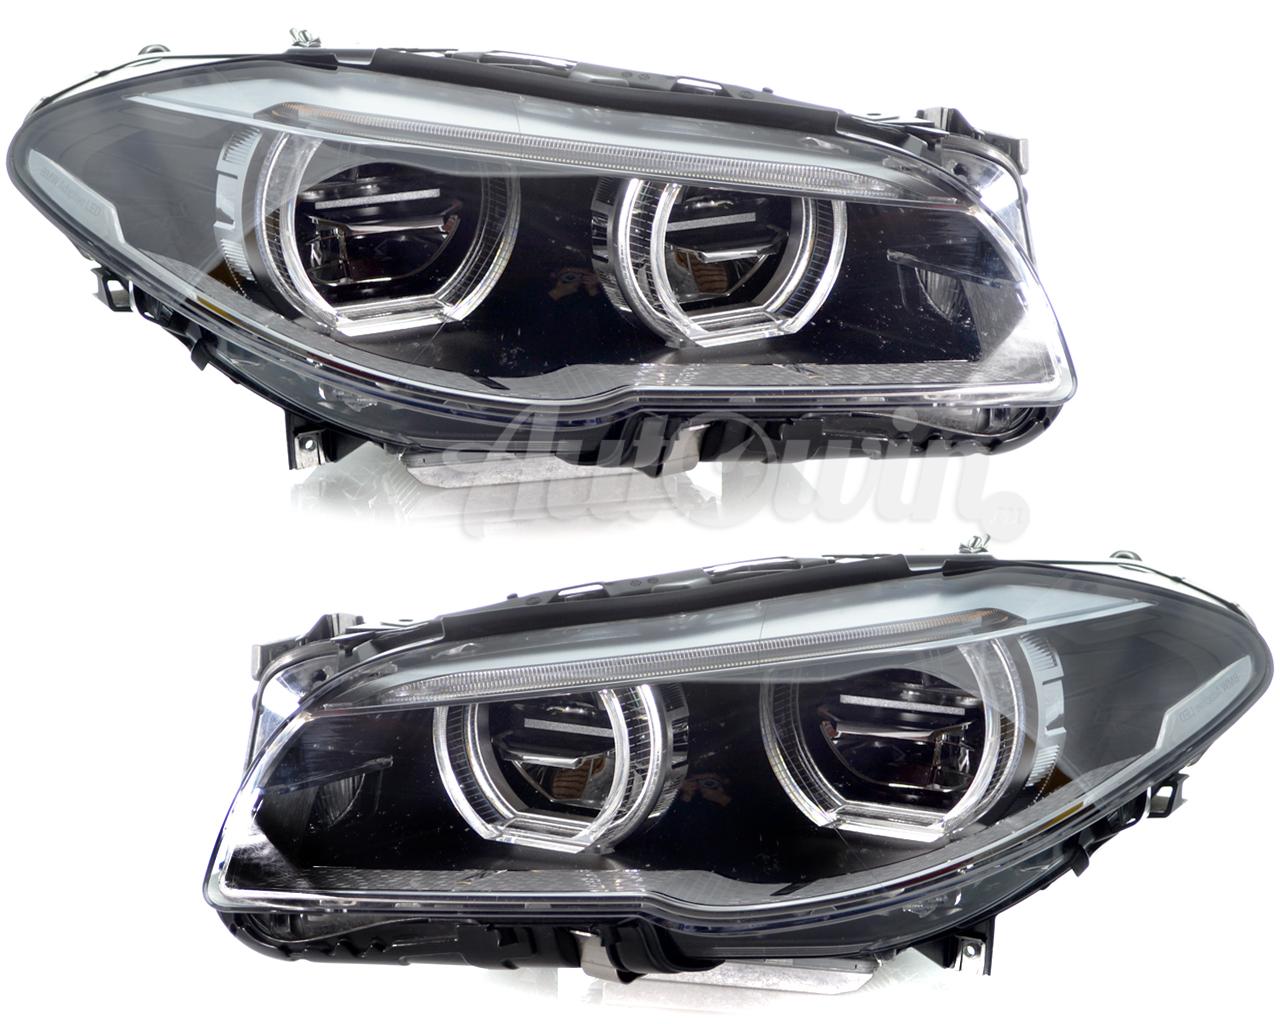 BMW 5 SERIES F10 F11 FULL LED ADAPTIVE HEADLIGHT ASSEMBLY LH & RH SIDE GENUINE   eBay